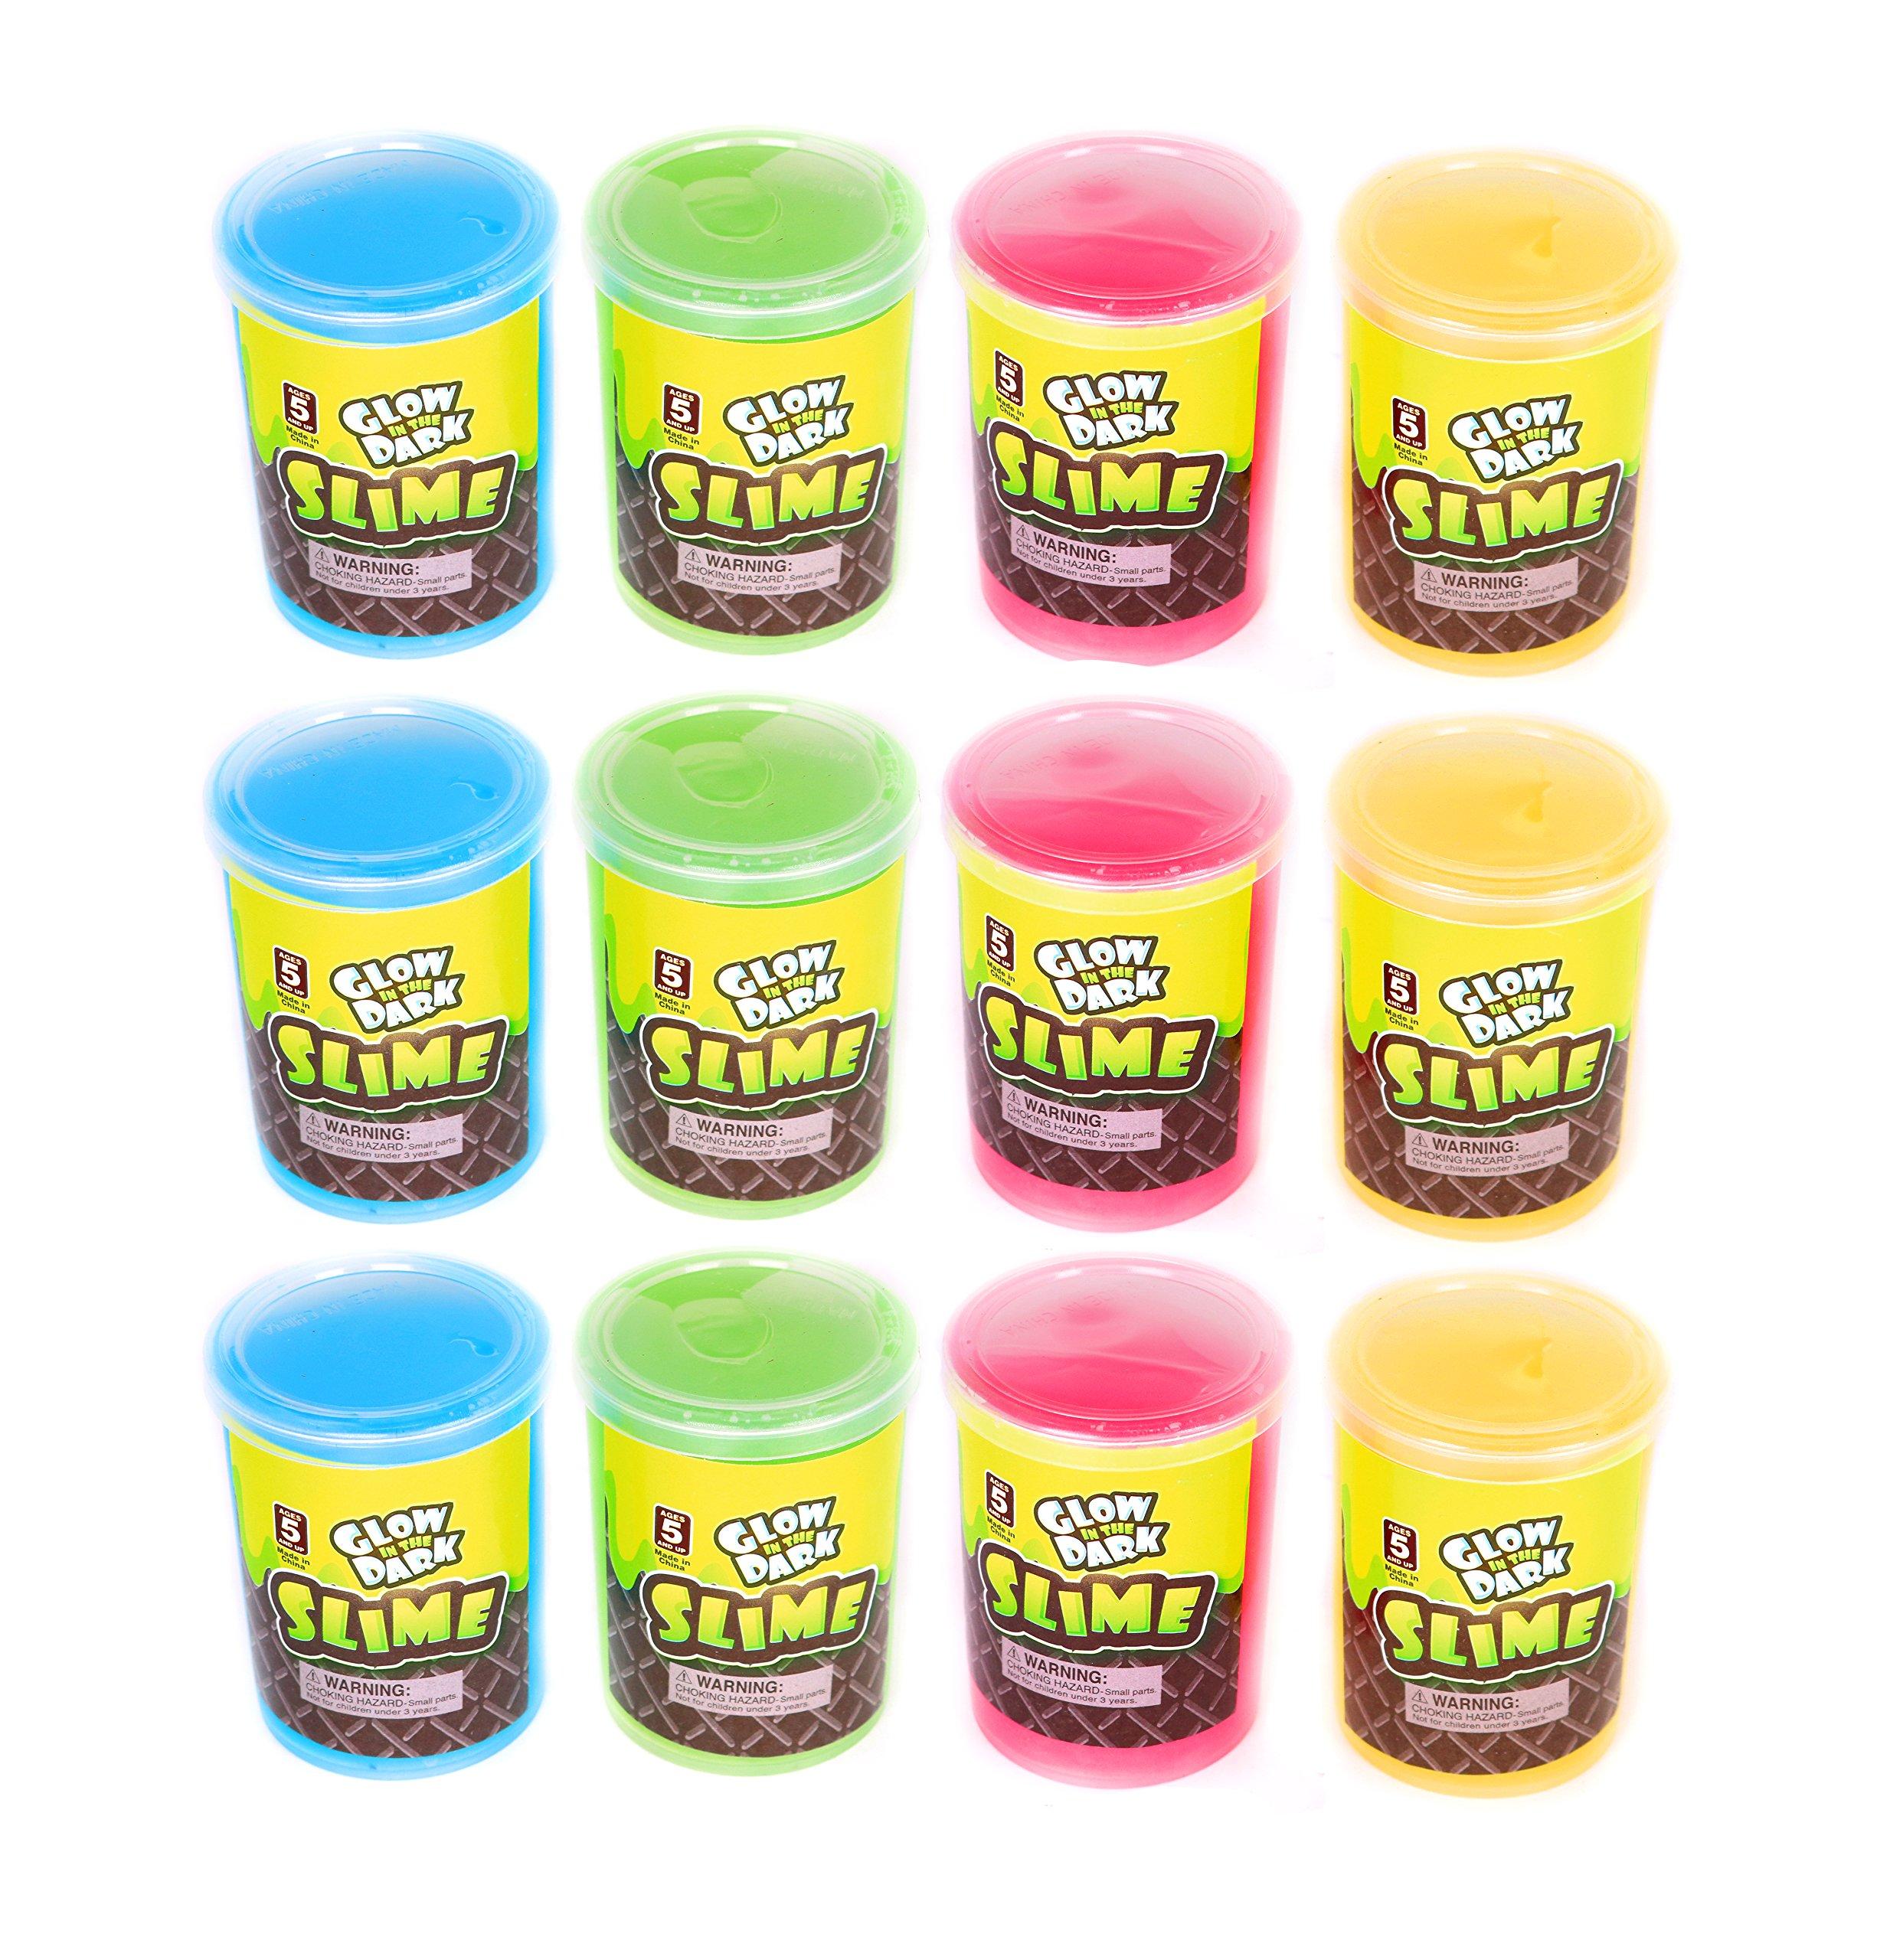 Glow In The Dark Slime - Bulk Pack Of 12 Assorted Colors Slime